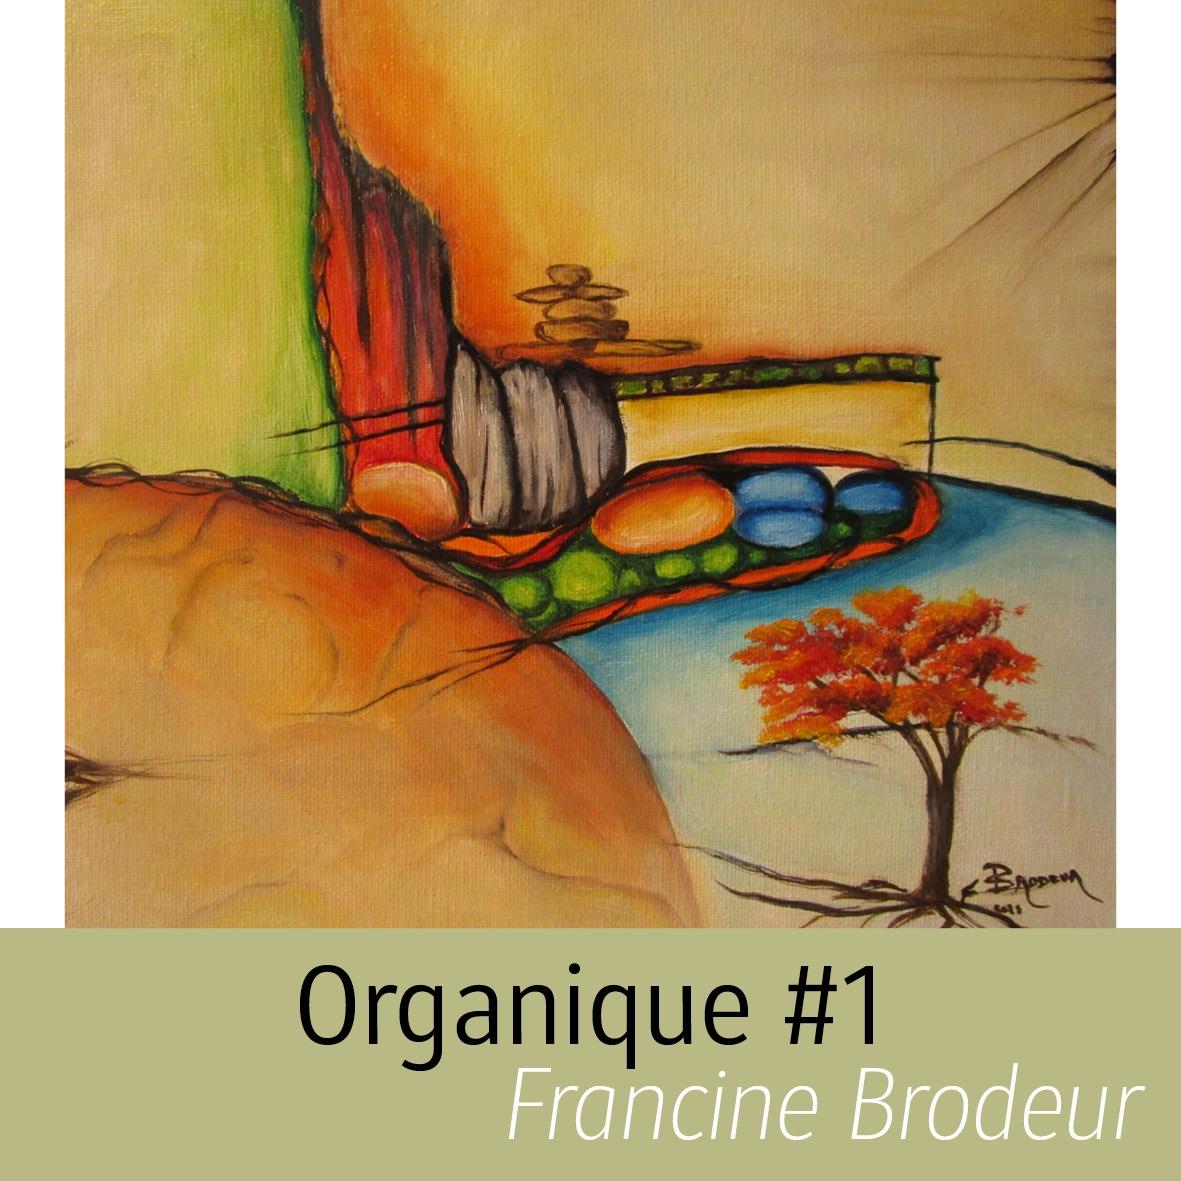 peinture de Francine Brodeur